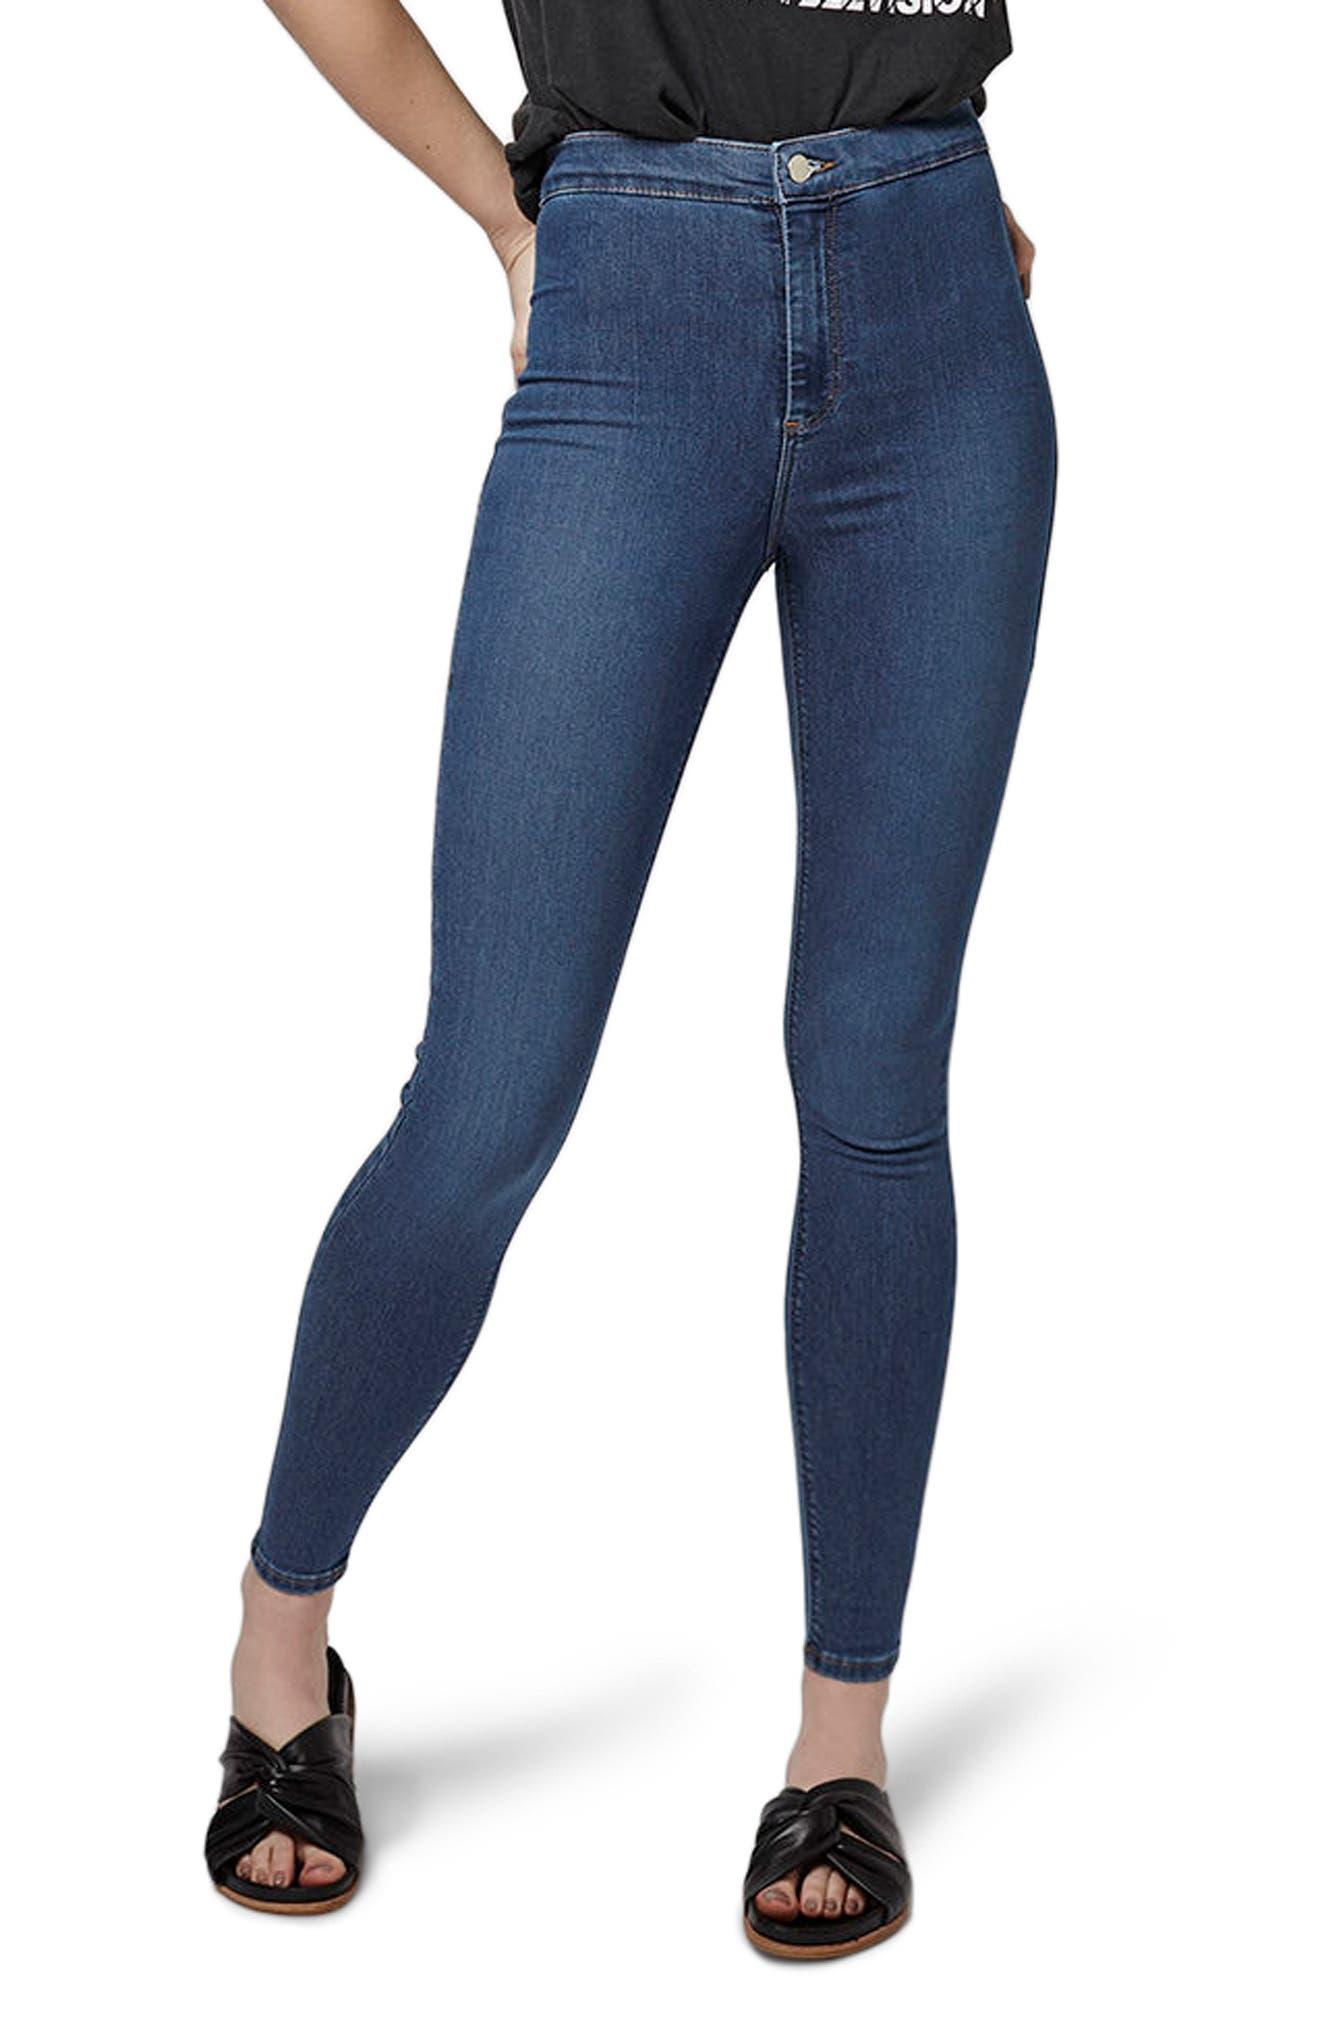 Joni Mid Denim Jeans,                         Main,                         color, Mid Denim